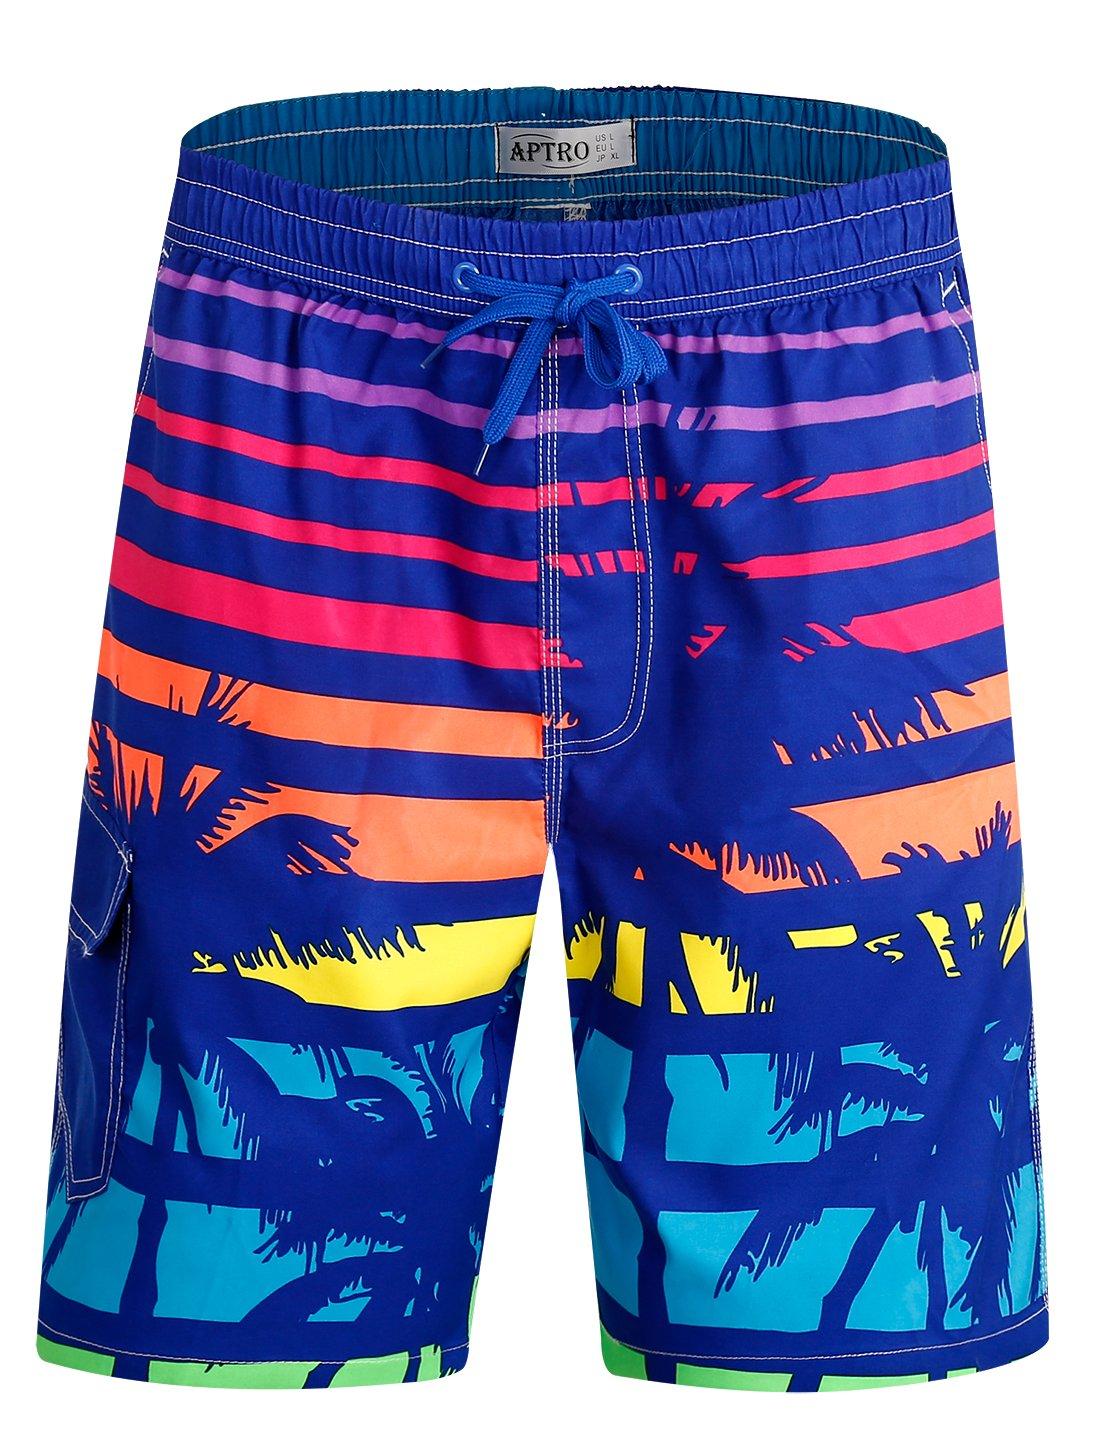 APTRO Men's Swim Trunks Beach Holiday Bathing Suits Swimwear #SG884 XL by APTRO